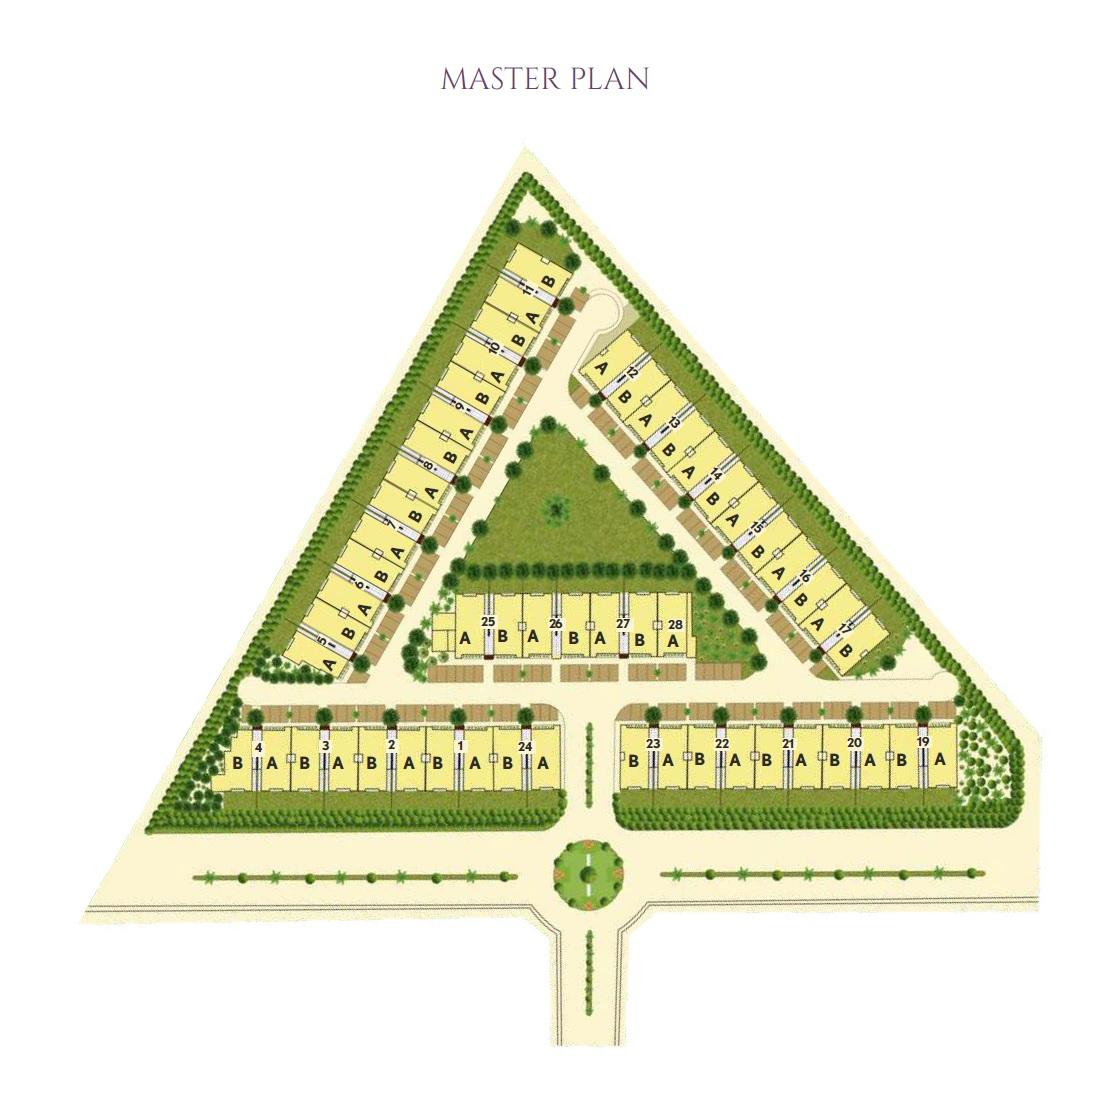 ss almeria master plan image11